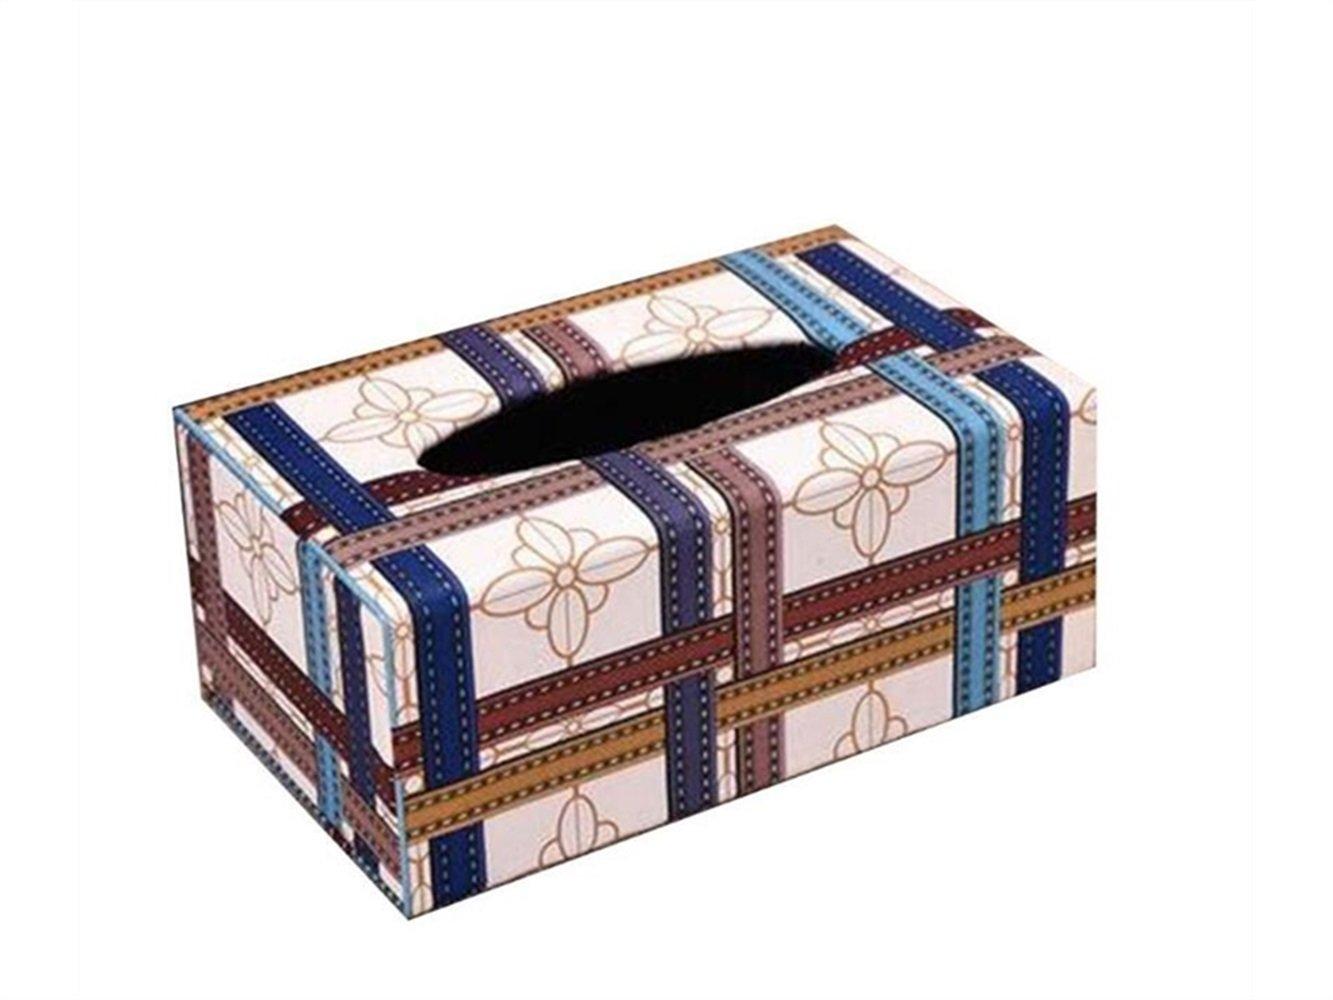 Pullic Tissue Box Chicken-Shaped Tissue Box Cartoon Animal Towel Storage Box Living Room Bedroom Plastic Napkin Paper Box (Color : As Shown, Size : 20128.5cm)